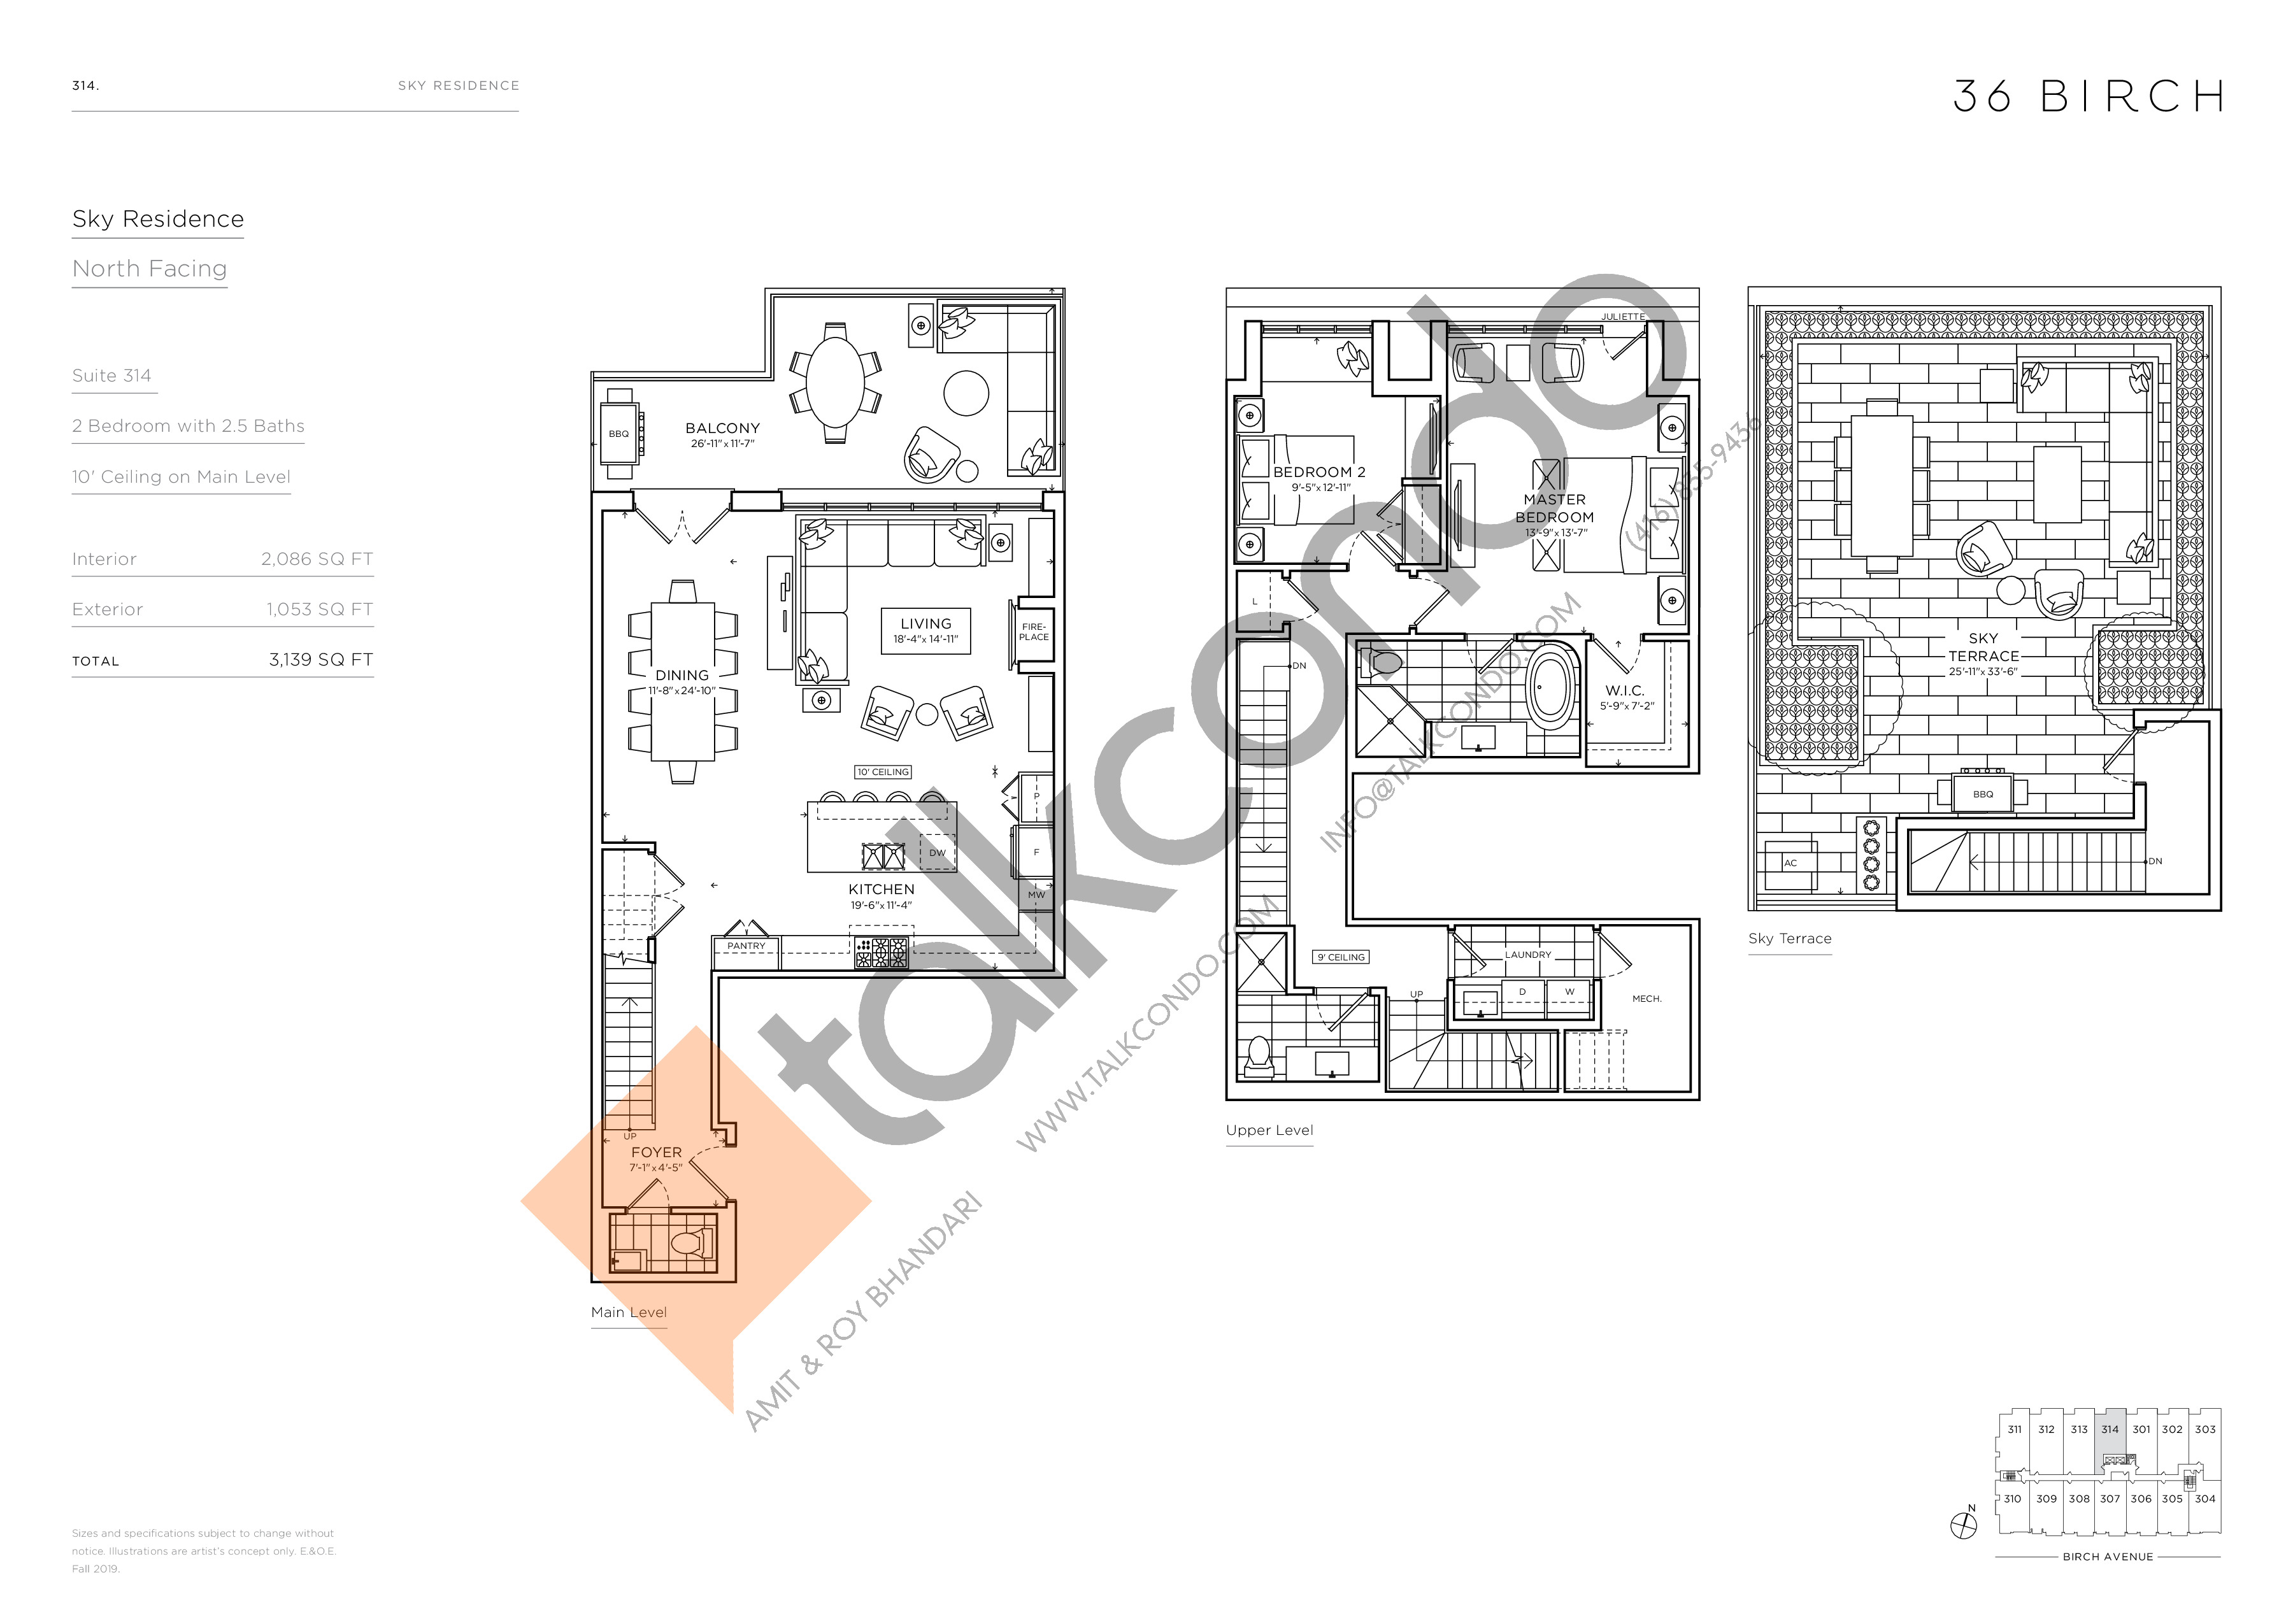 314 - Sky Residence Floor Plan at 36 Birch Avenue Condos - 2086 sq.ft